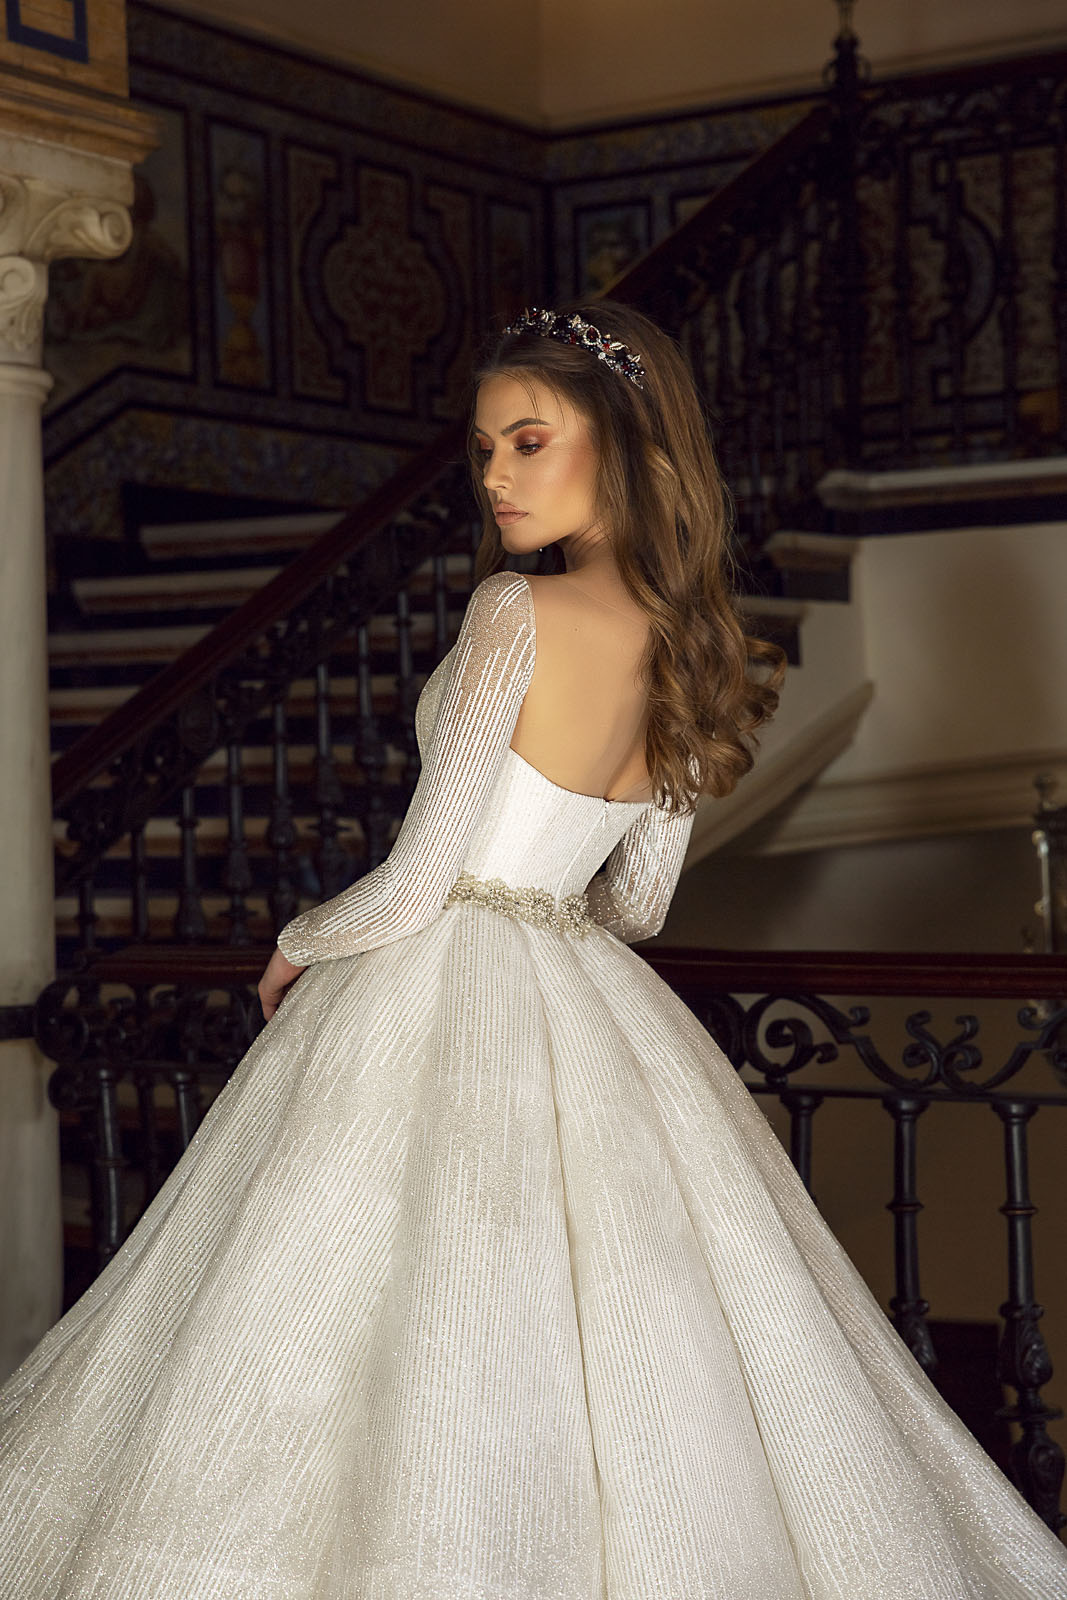 BRIDGET-Maks Mariano-Tina Valerdi - Suknie ślubne